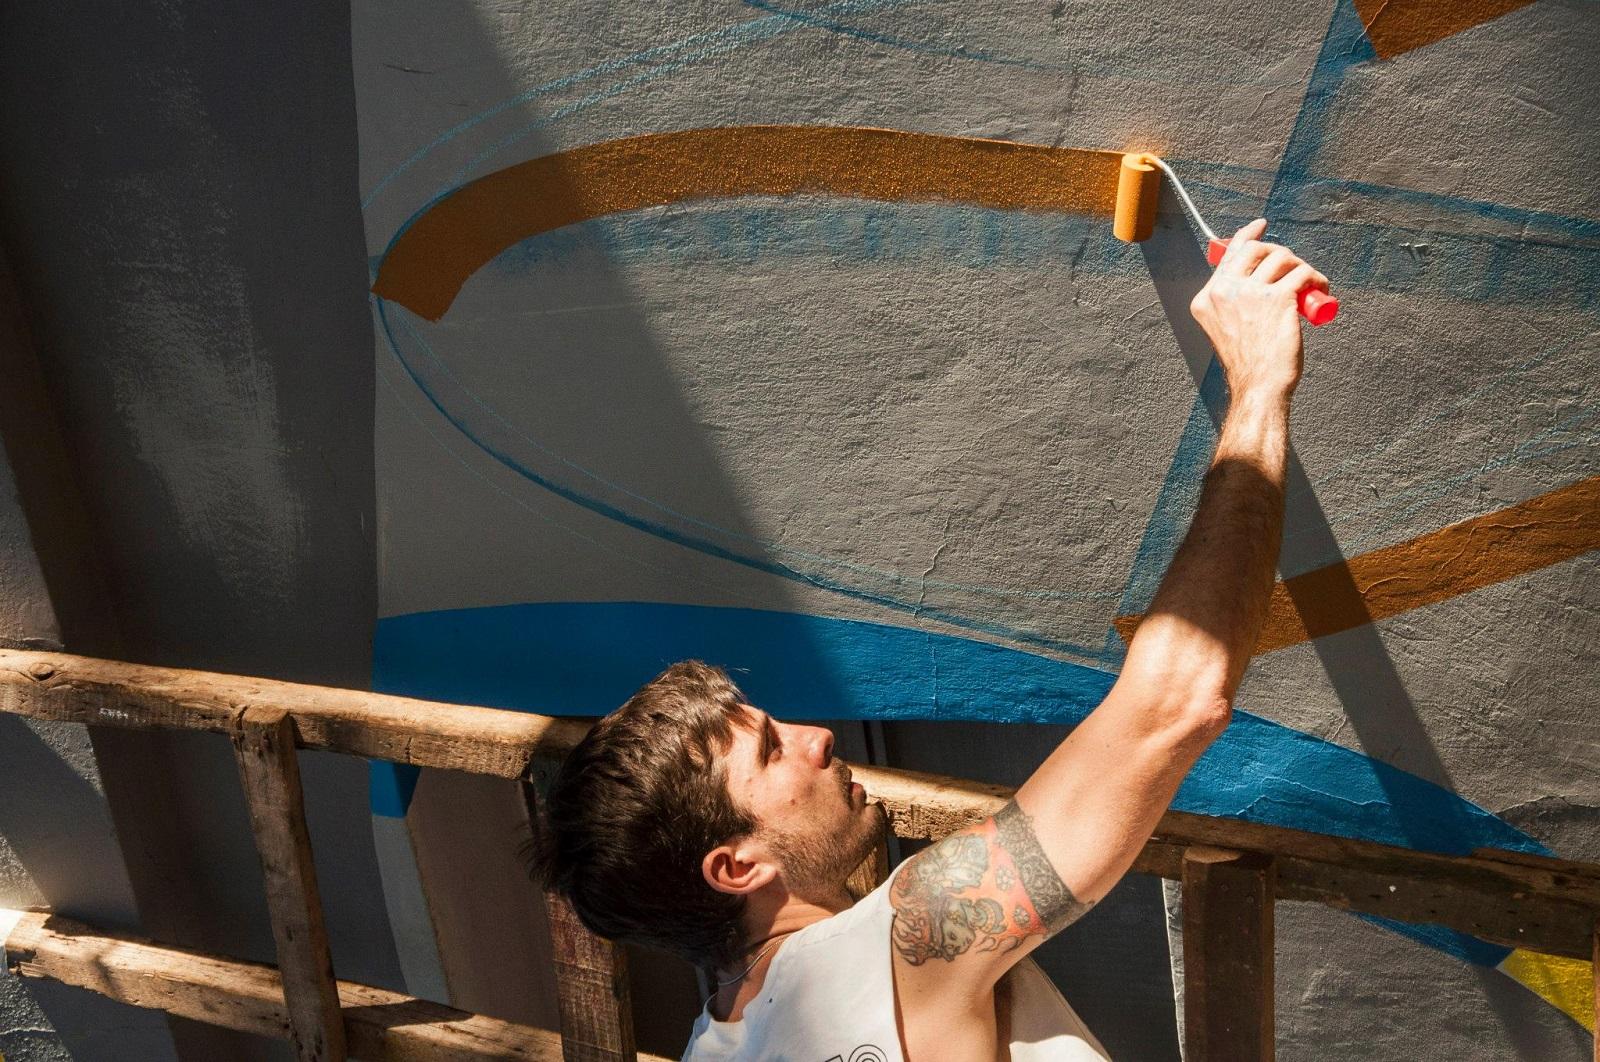 pedro-perelman-new-mural-for-oficio-residence-04